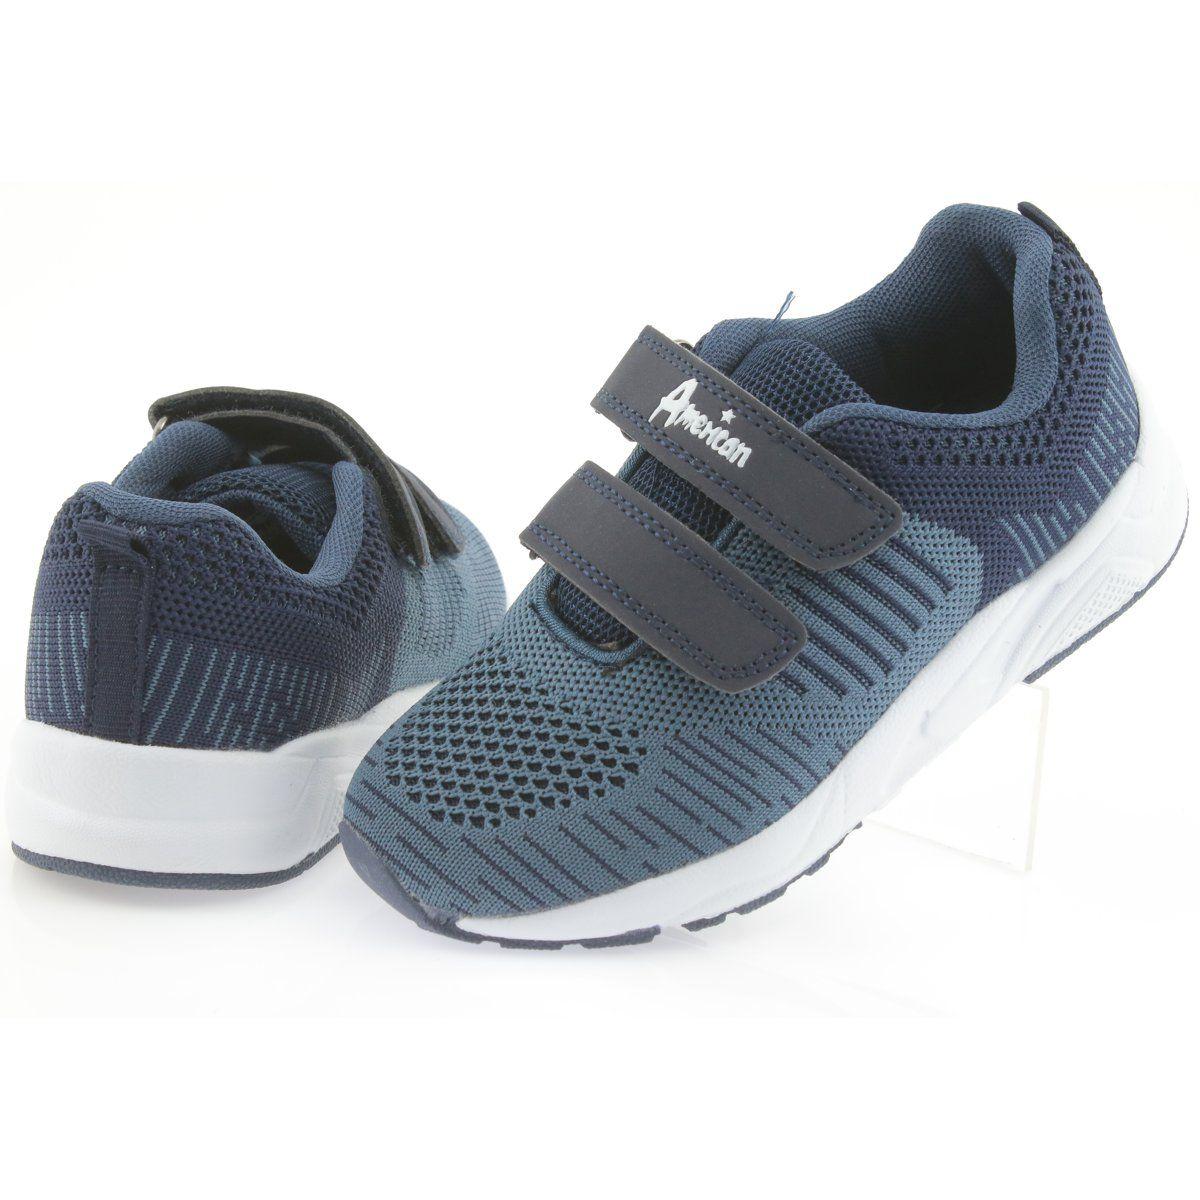 American Club Buty Sportowe Na Rzepy American Ca05 Granatowe Sports Shoes Kid Shoes Shoes